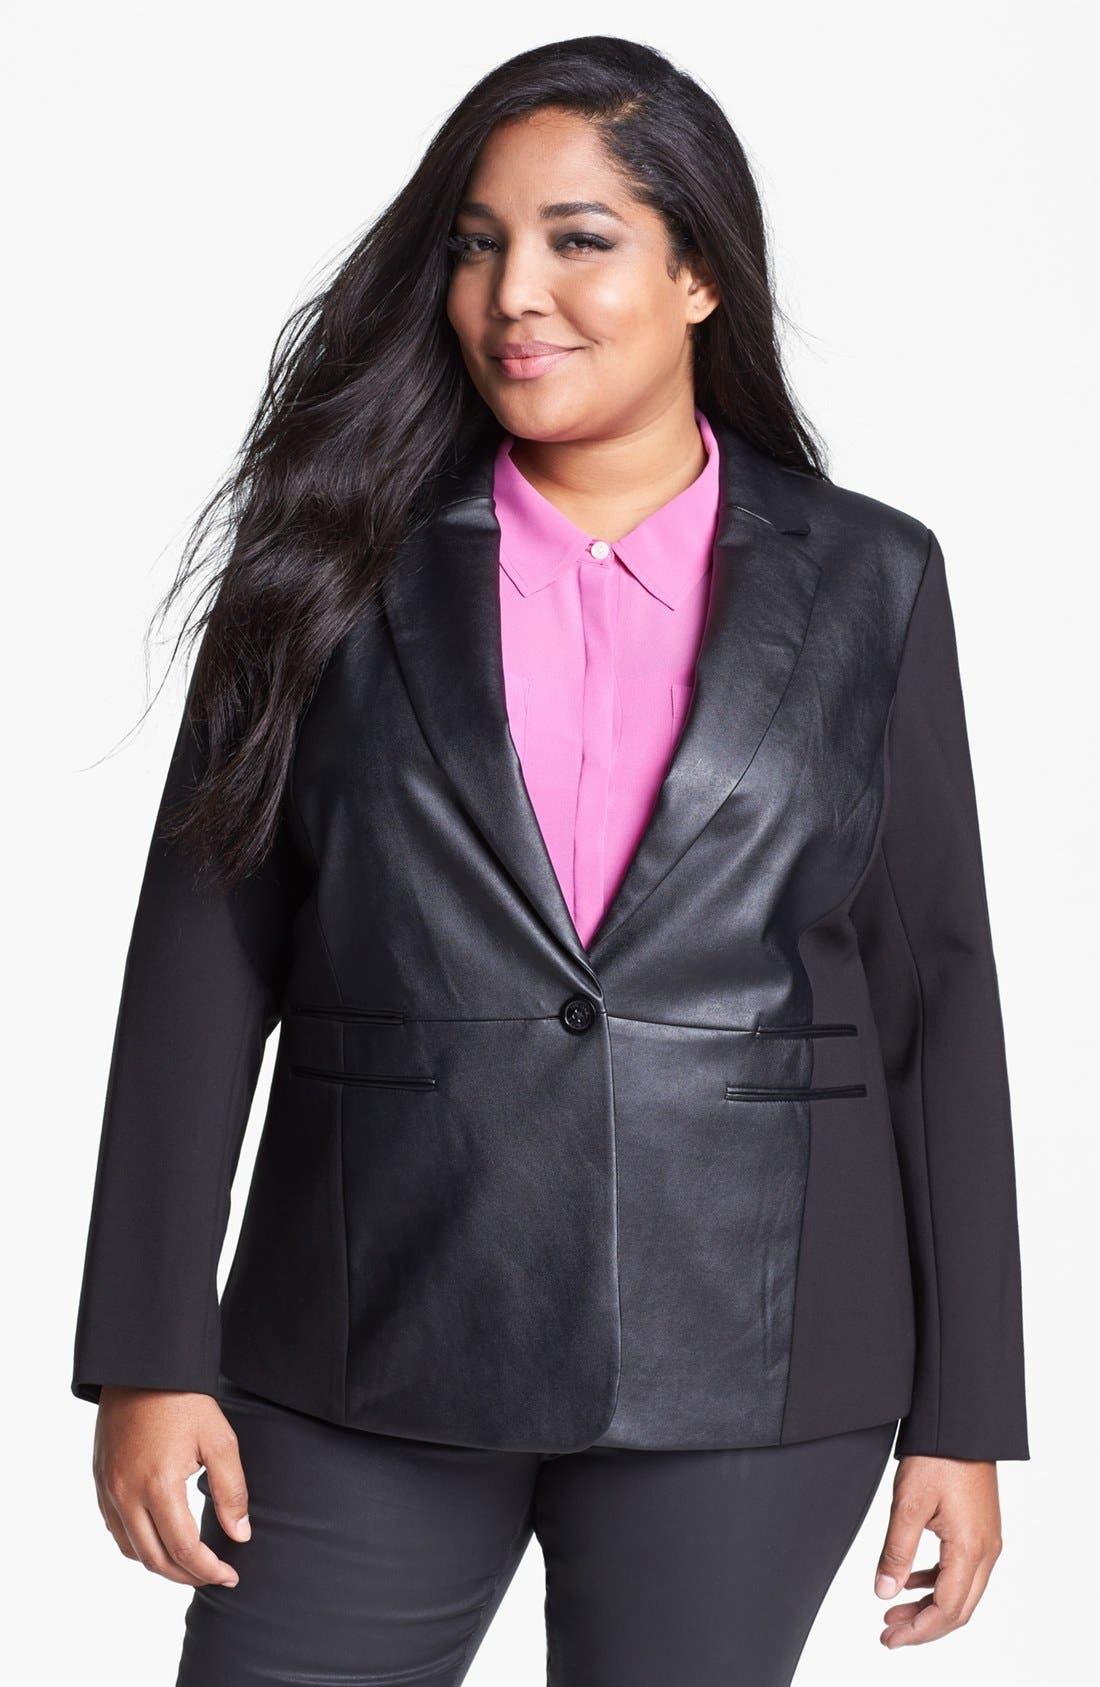 Alternate Image 1 Selected - MICHAEL Michael Kors Faux Leather & Ponte Knit Blazer (Plus Size)